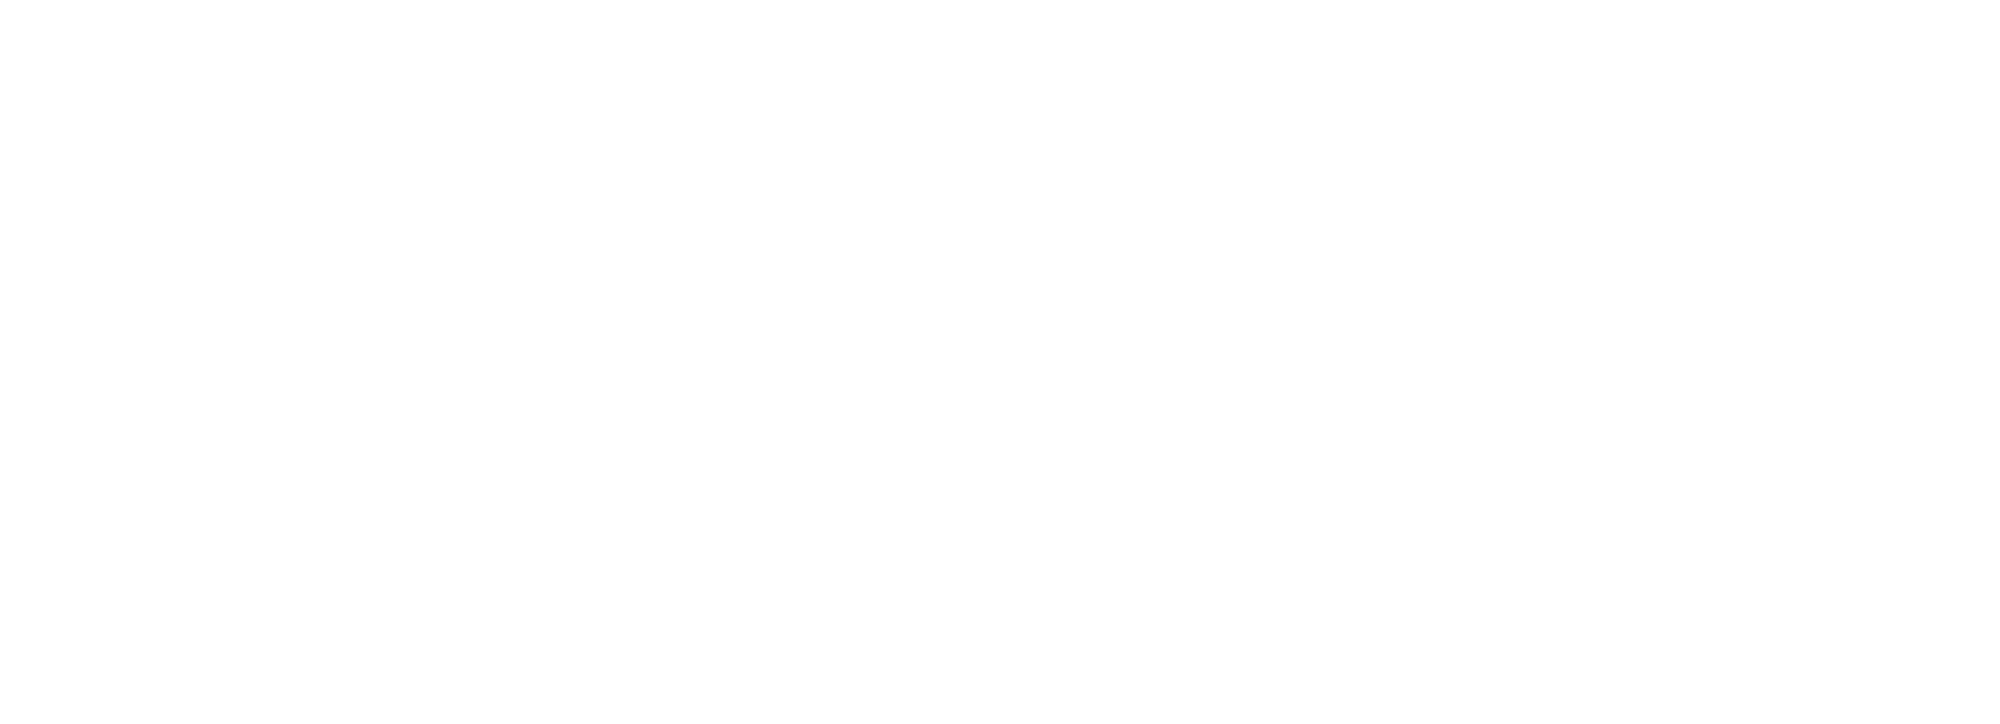 residence-nishiki overview